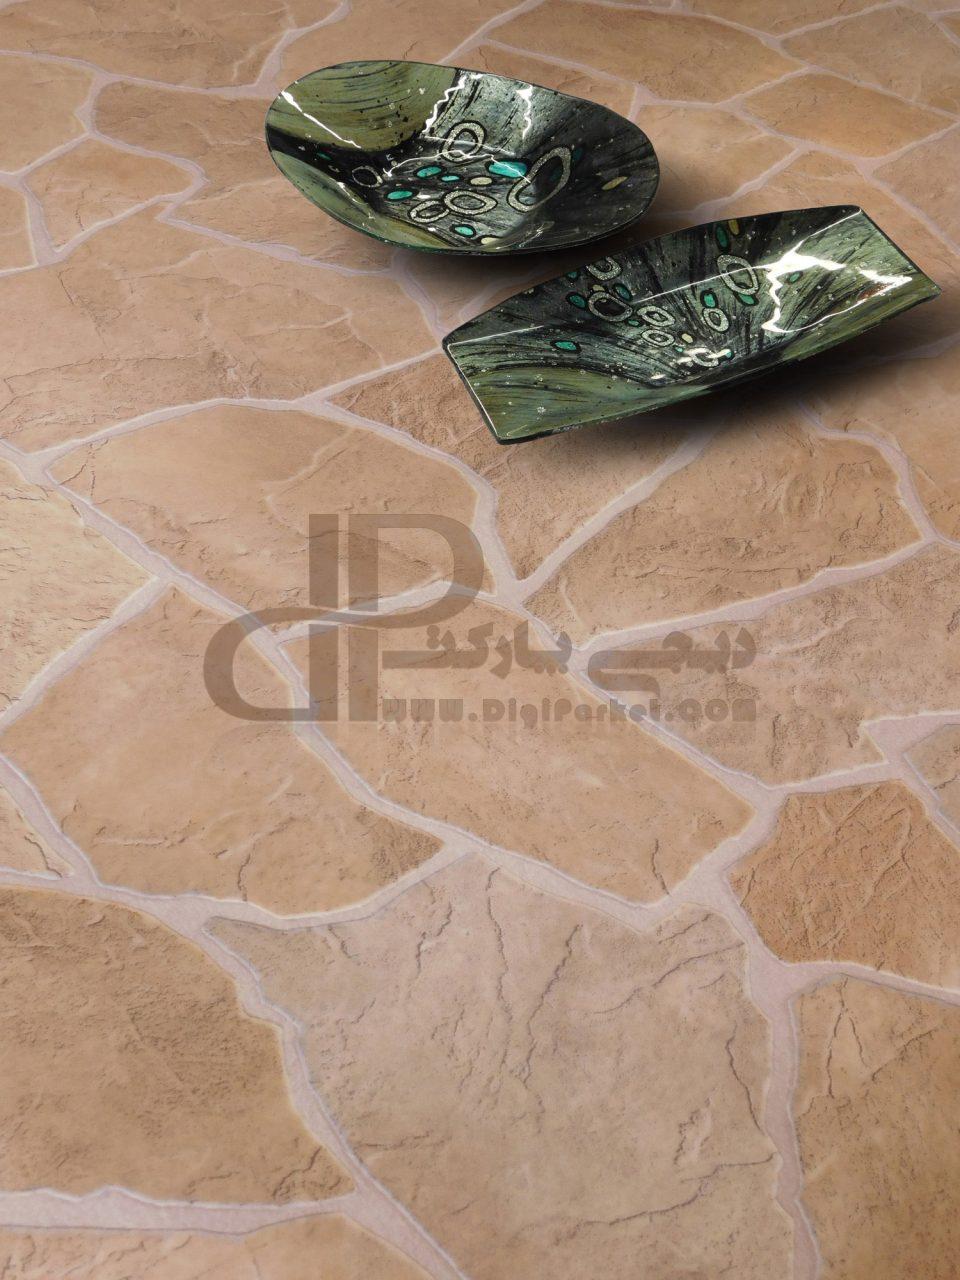 کفپوش استارت طرح سنگ فرش محصول بلژیک 1195